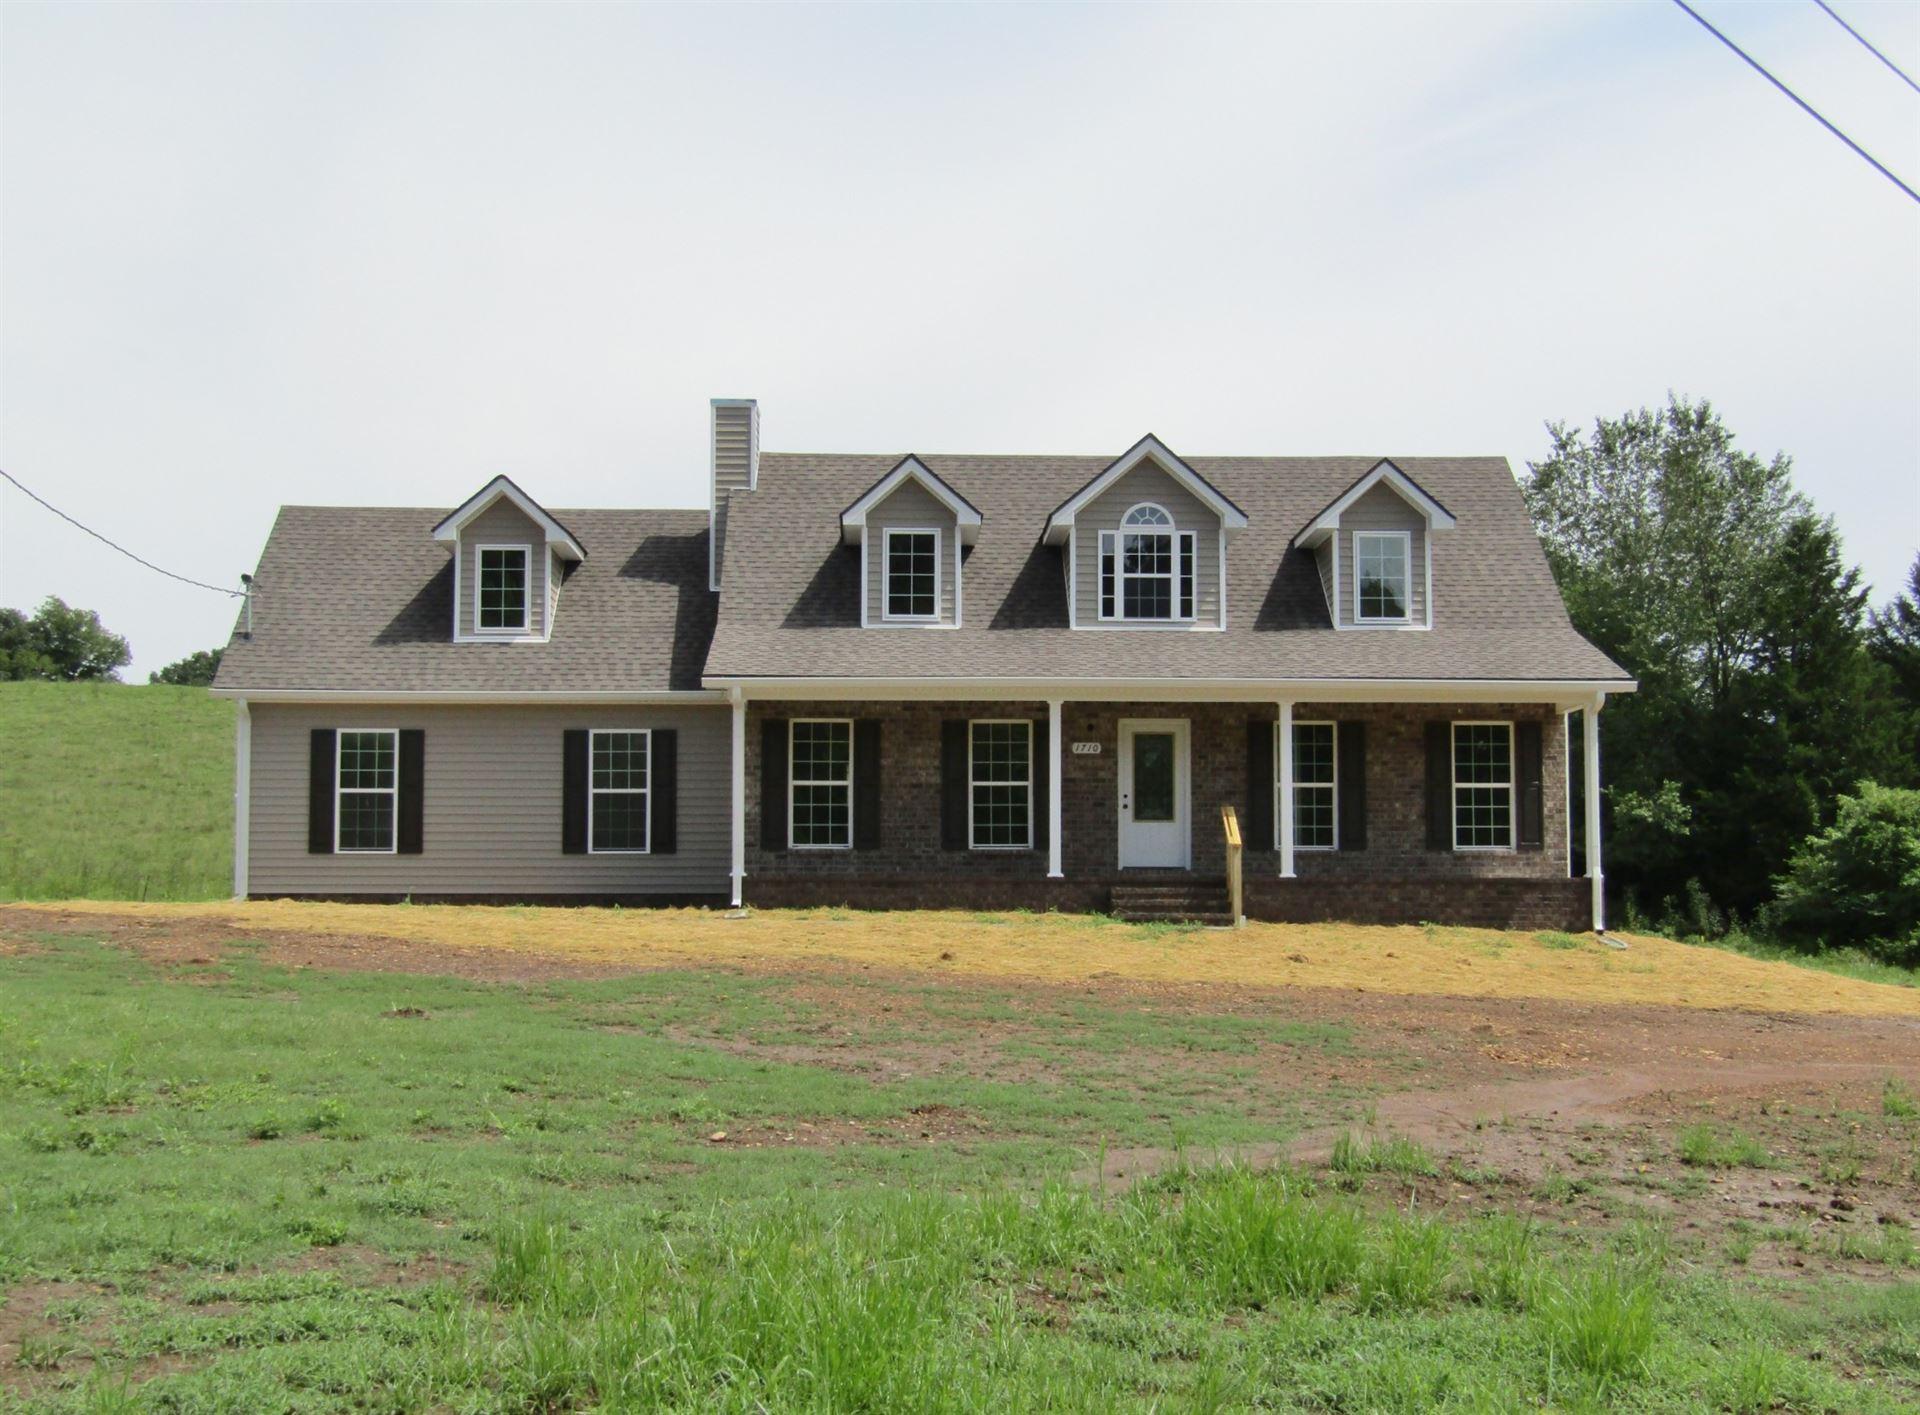 1710 Collins Hollow Rd, Lewisburg, TN 37091 - MLS#: 2256077